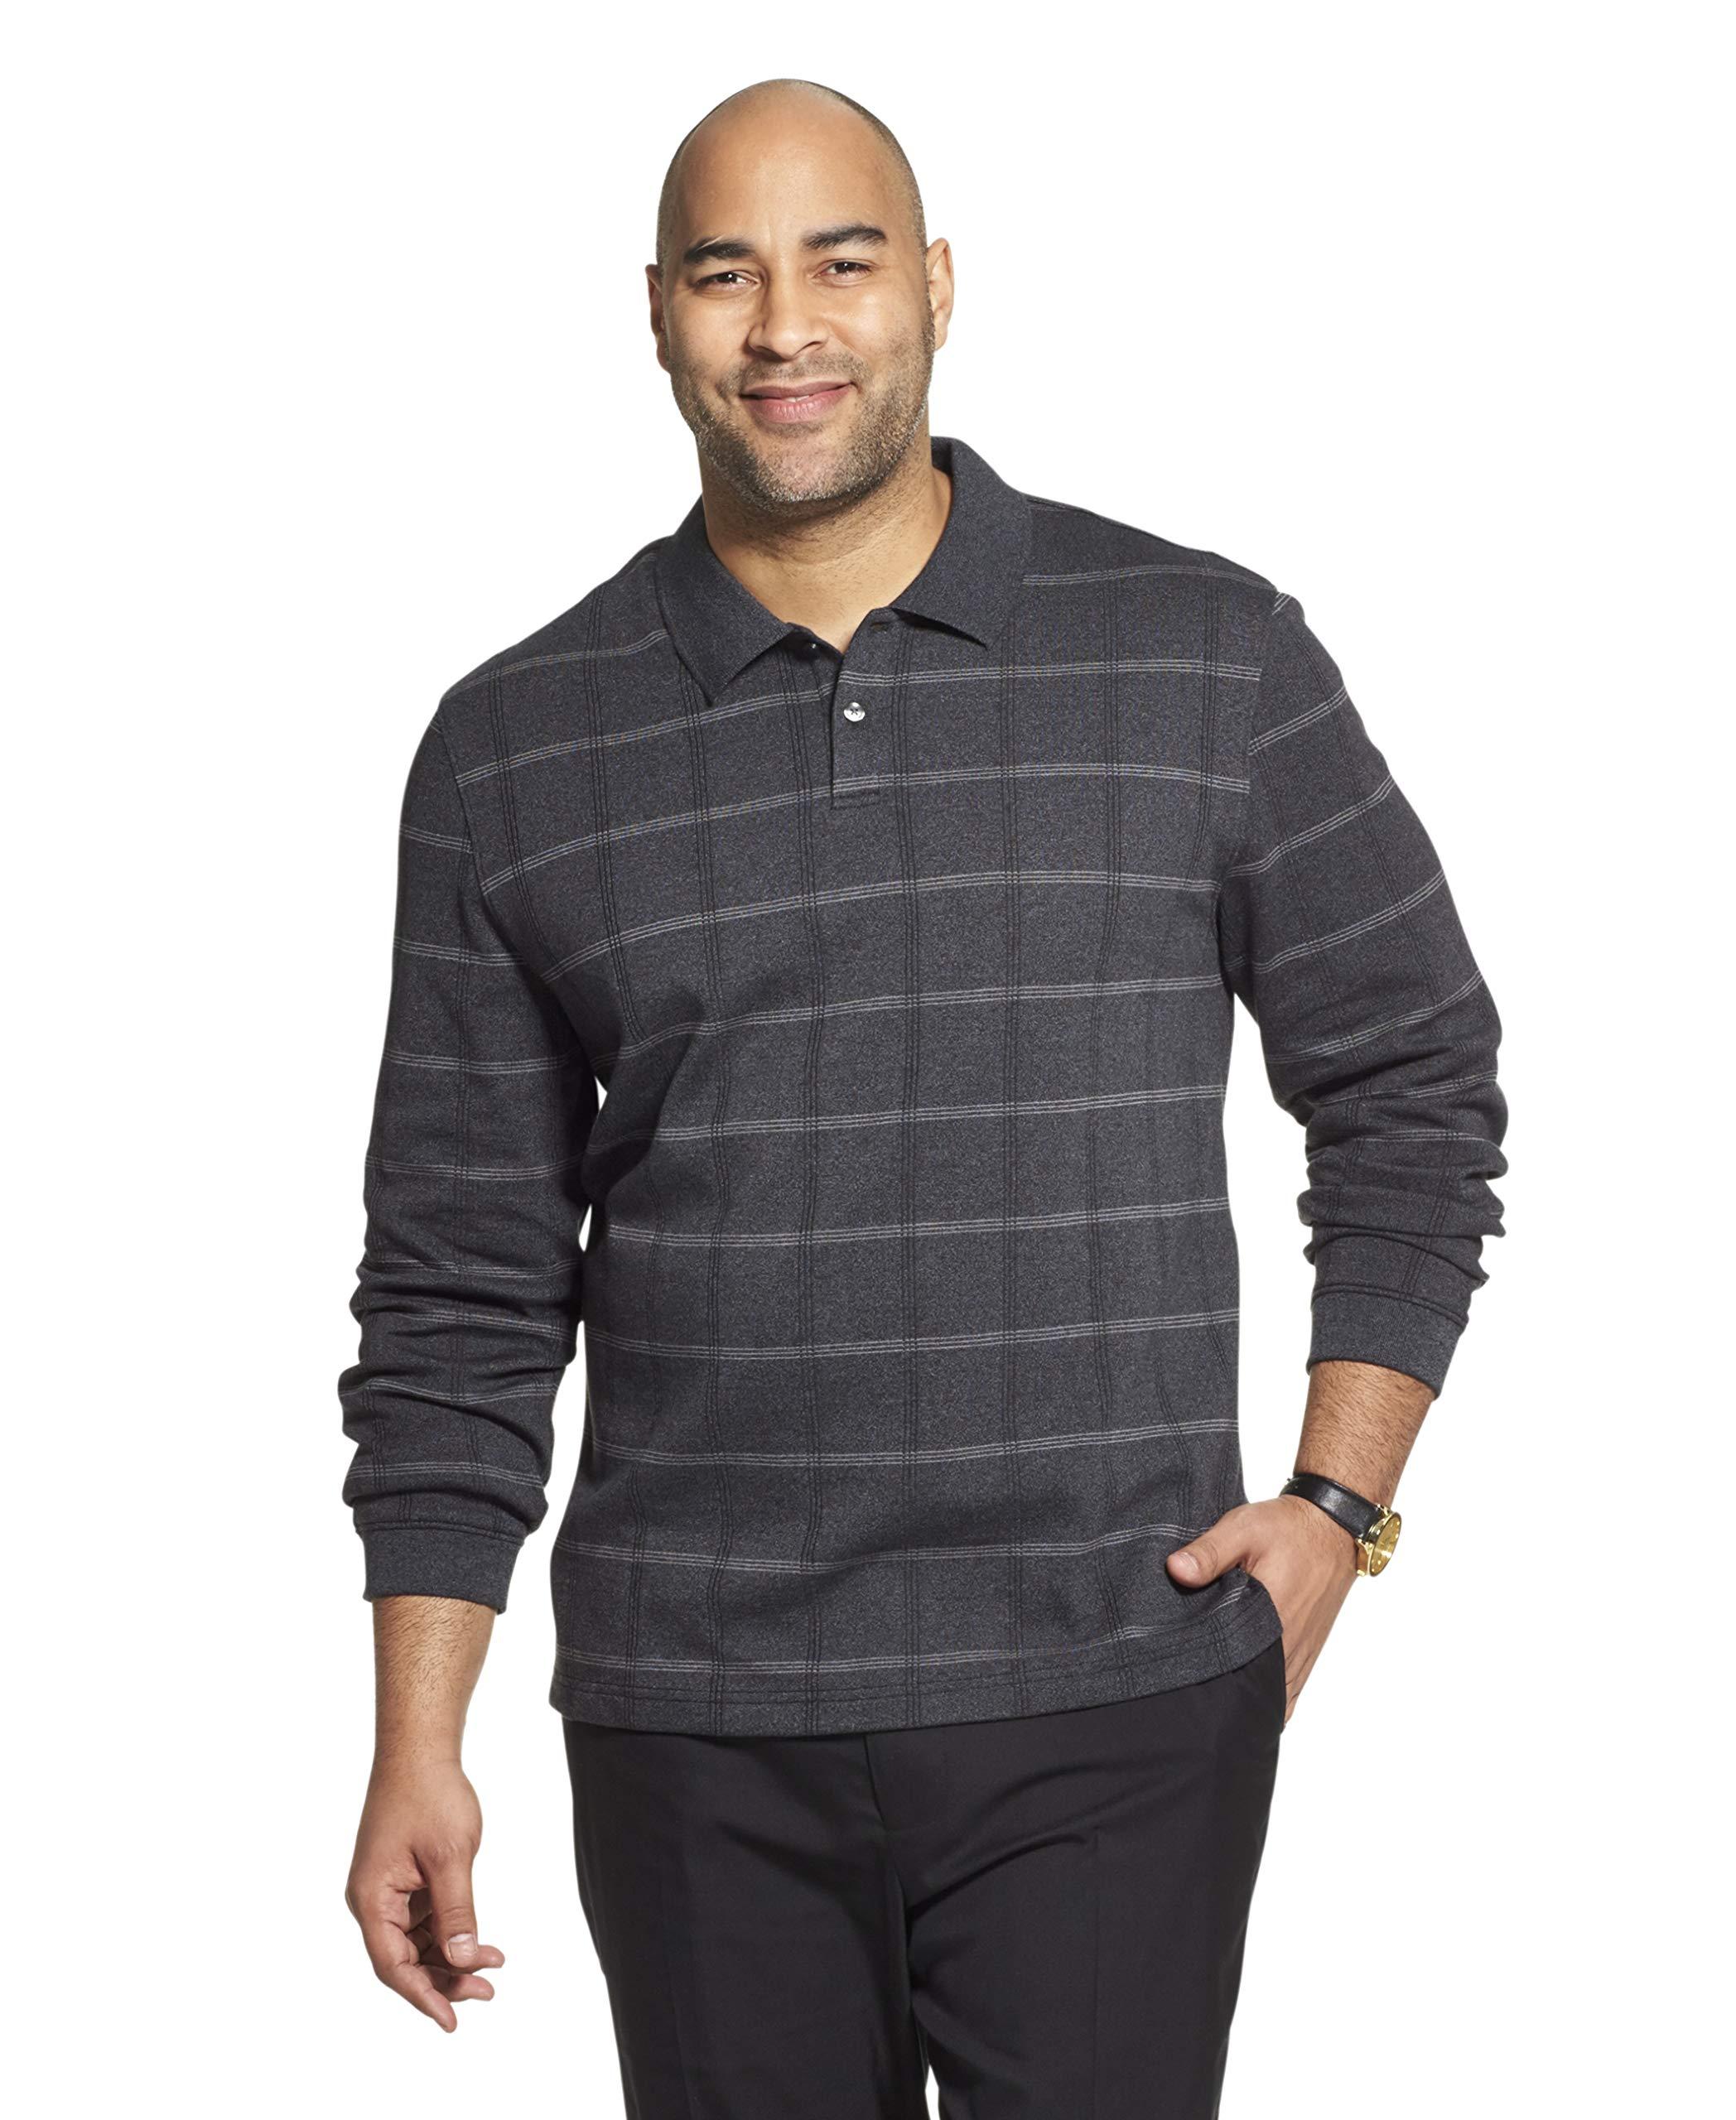 Van Heusen Men's Big and Tall Flex Long Sleeve Jaspe Windowpane Polo Shirt